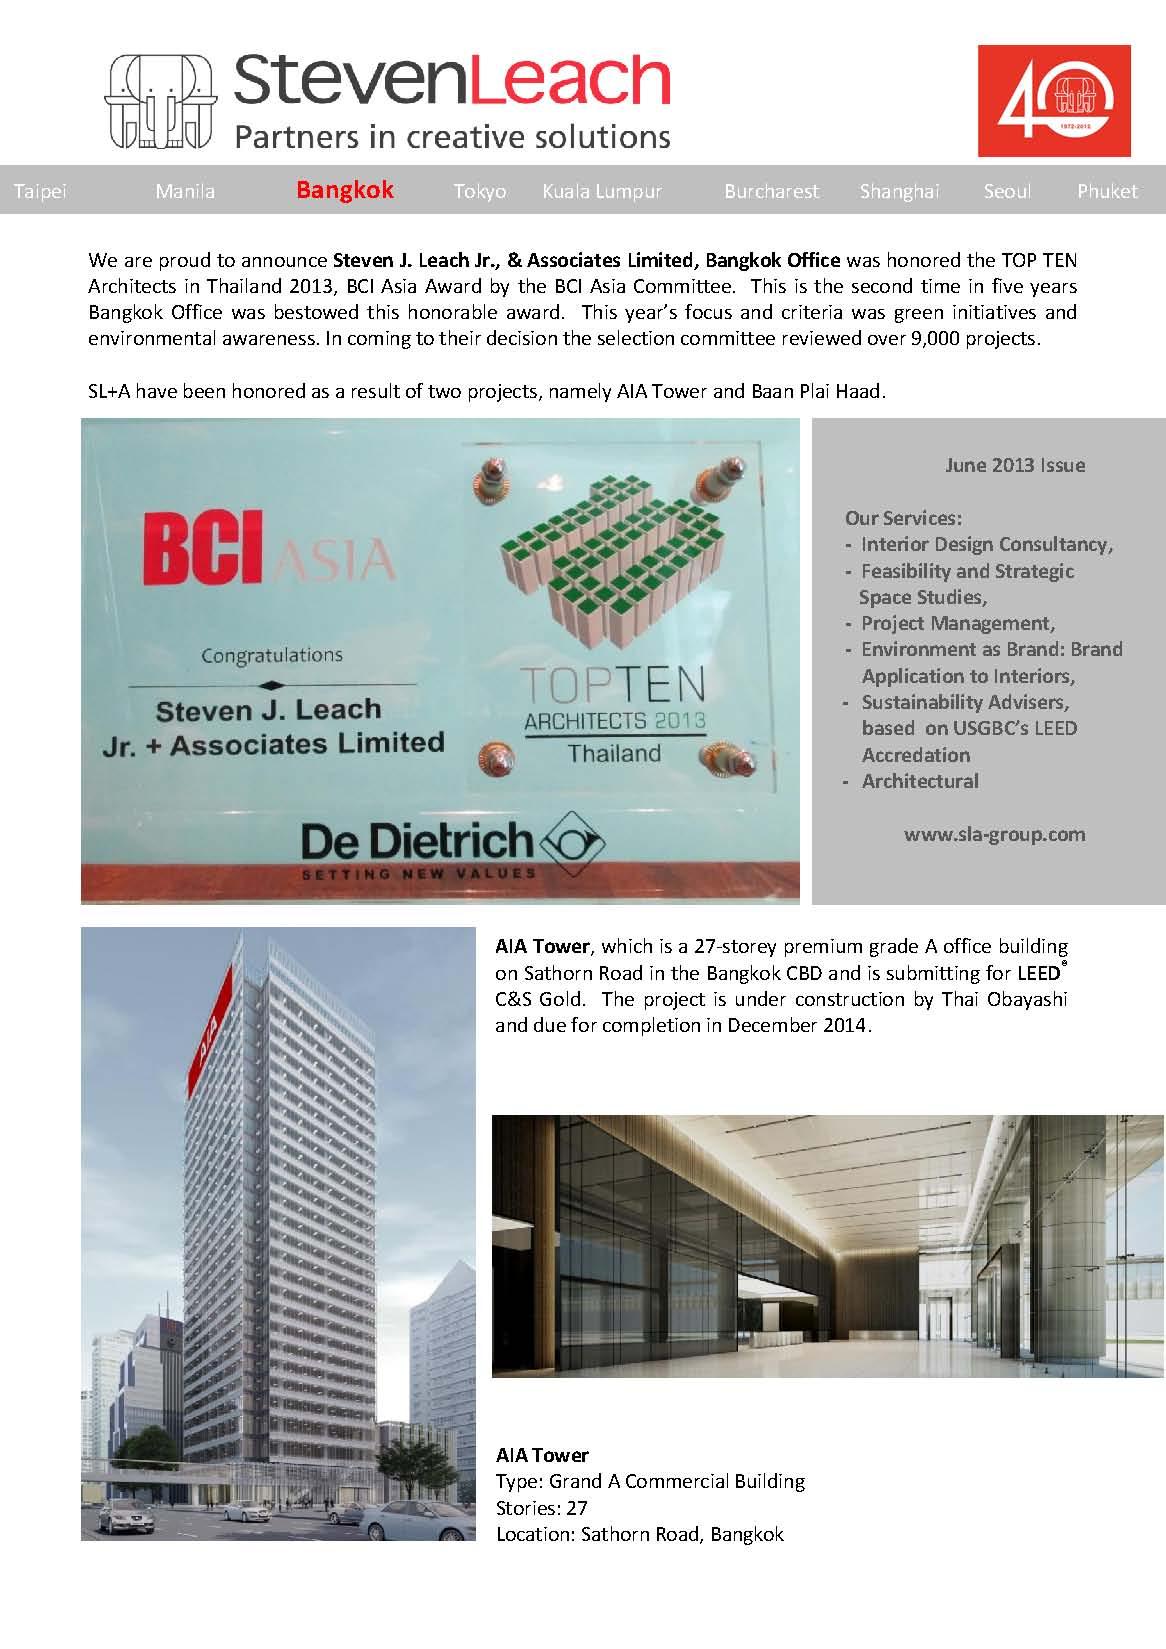 Top Ten Architects 2013